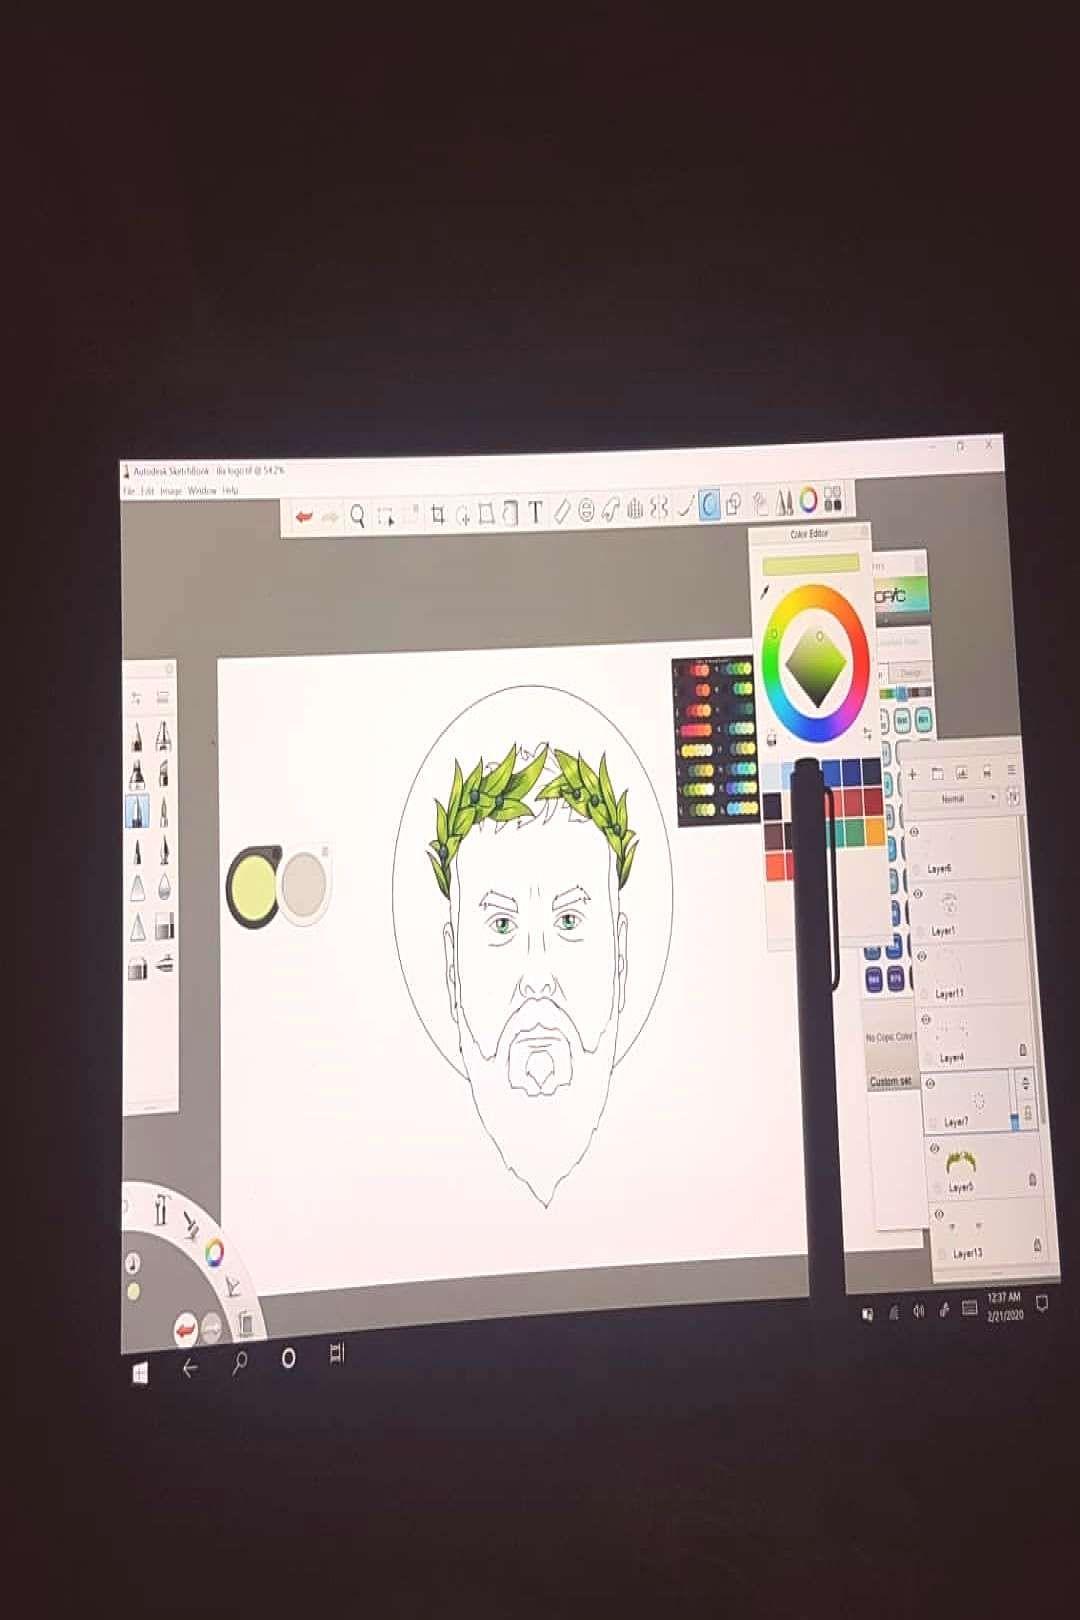 #autodesksketchbook #microsoftsurface #iliasarkhosidis #sarkhosidis #sketchbook #microsoft #february #tagging #shared #202020 #photo #log #by #on #microsoft #micr...